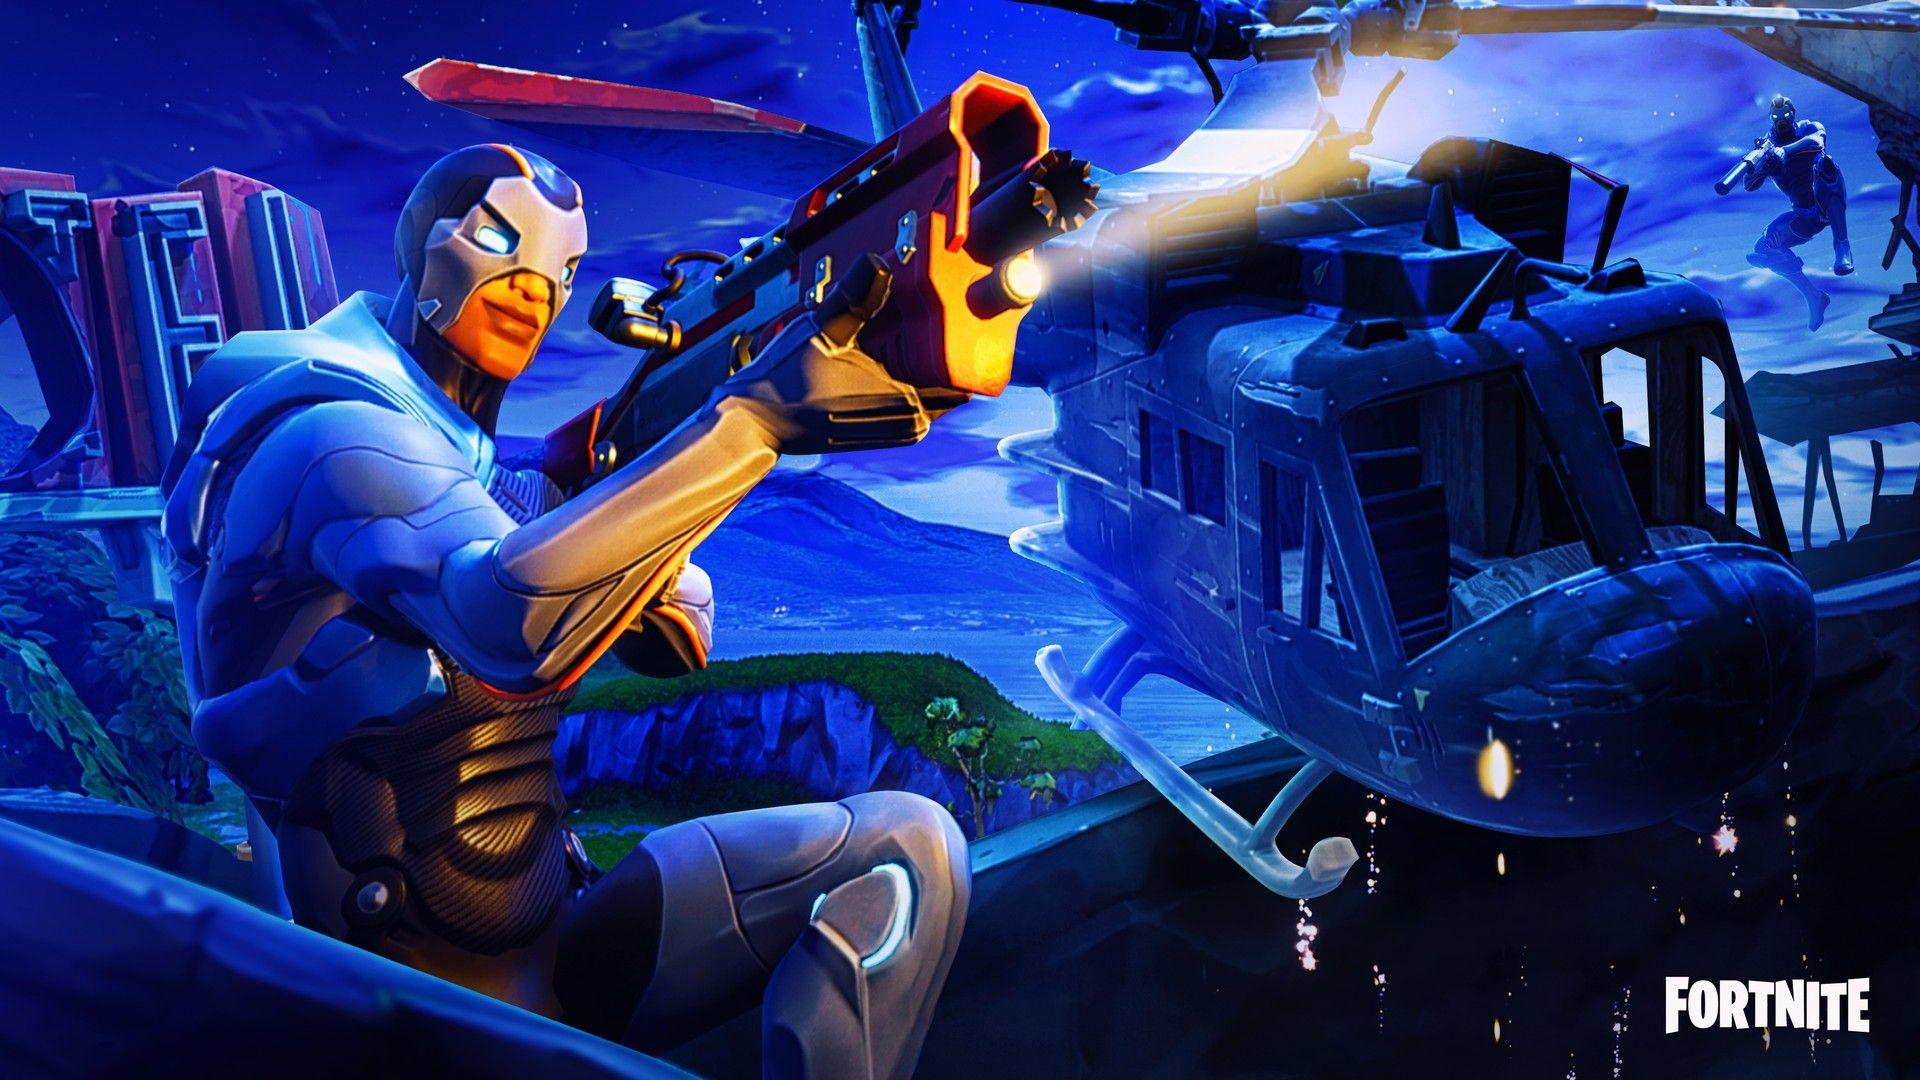 Wallpaper Fortnite Hd 2020 Live Wallpaper Hd Fortnite Epic Games Fortnite Battle Royale Game